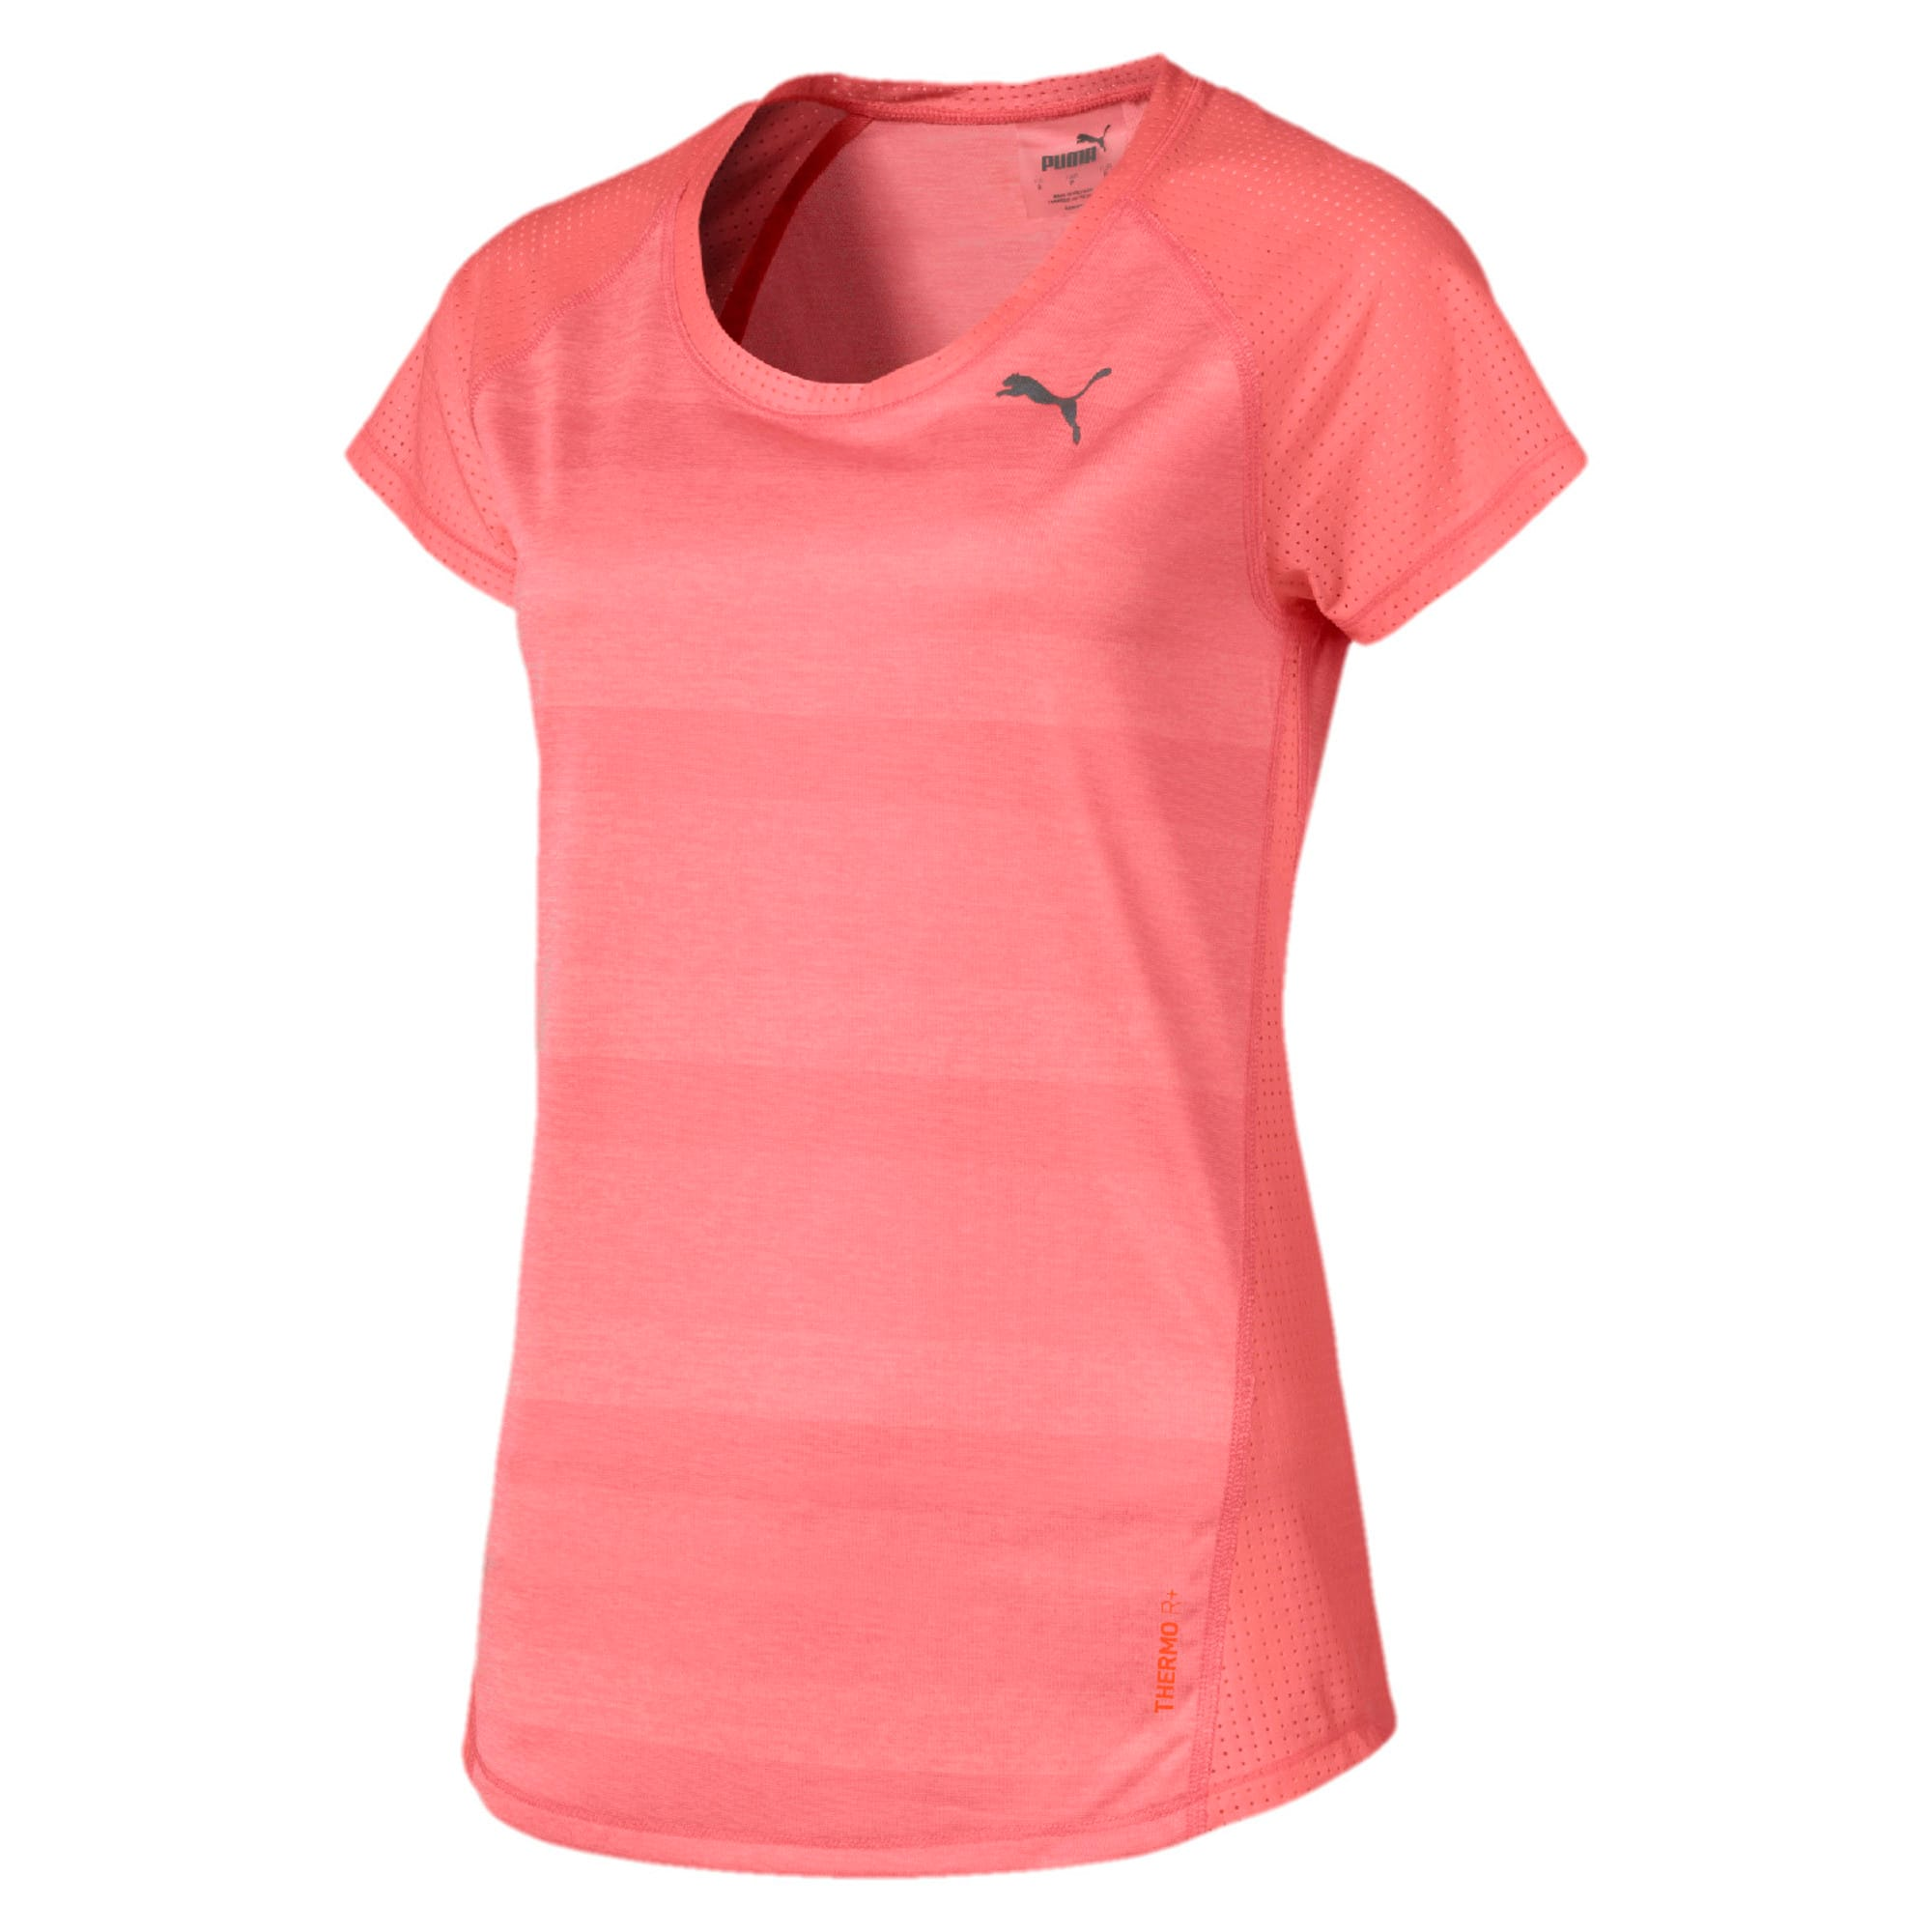 Thumbnail 4 of Thermo-R+ Short Sleeve Women's Running Tee, Bright Peach Heather, medium-IND